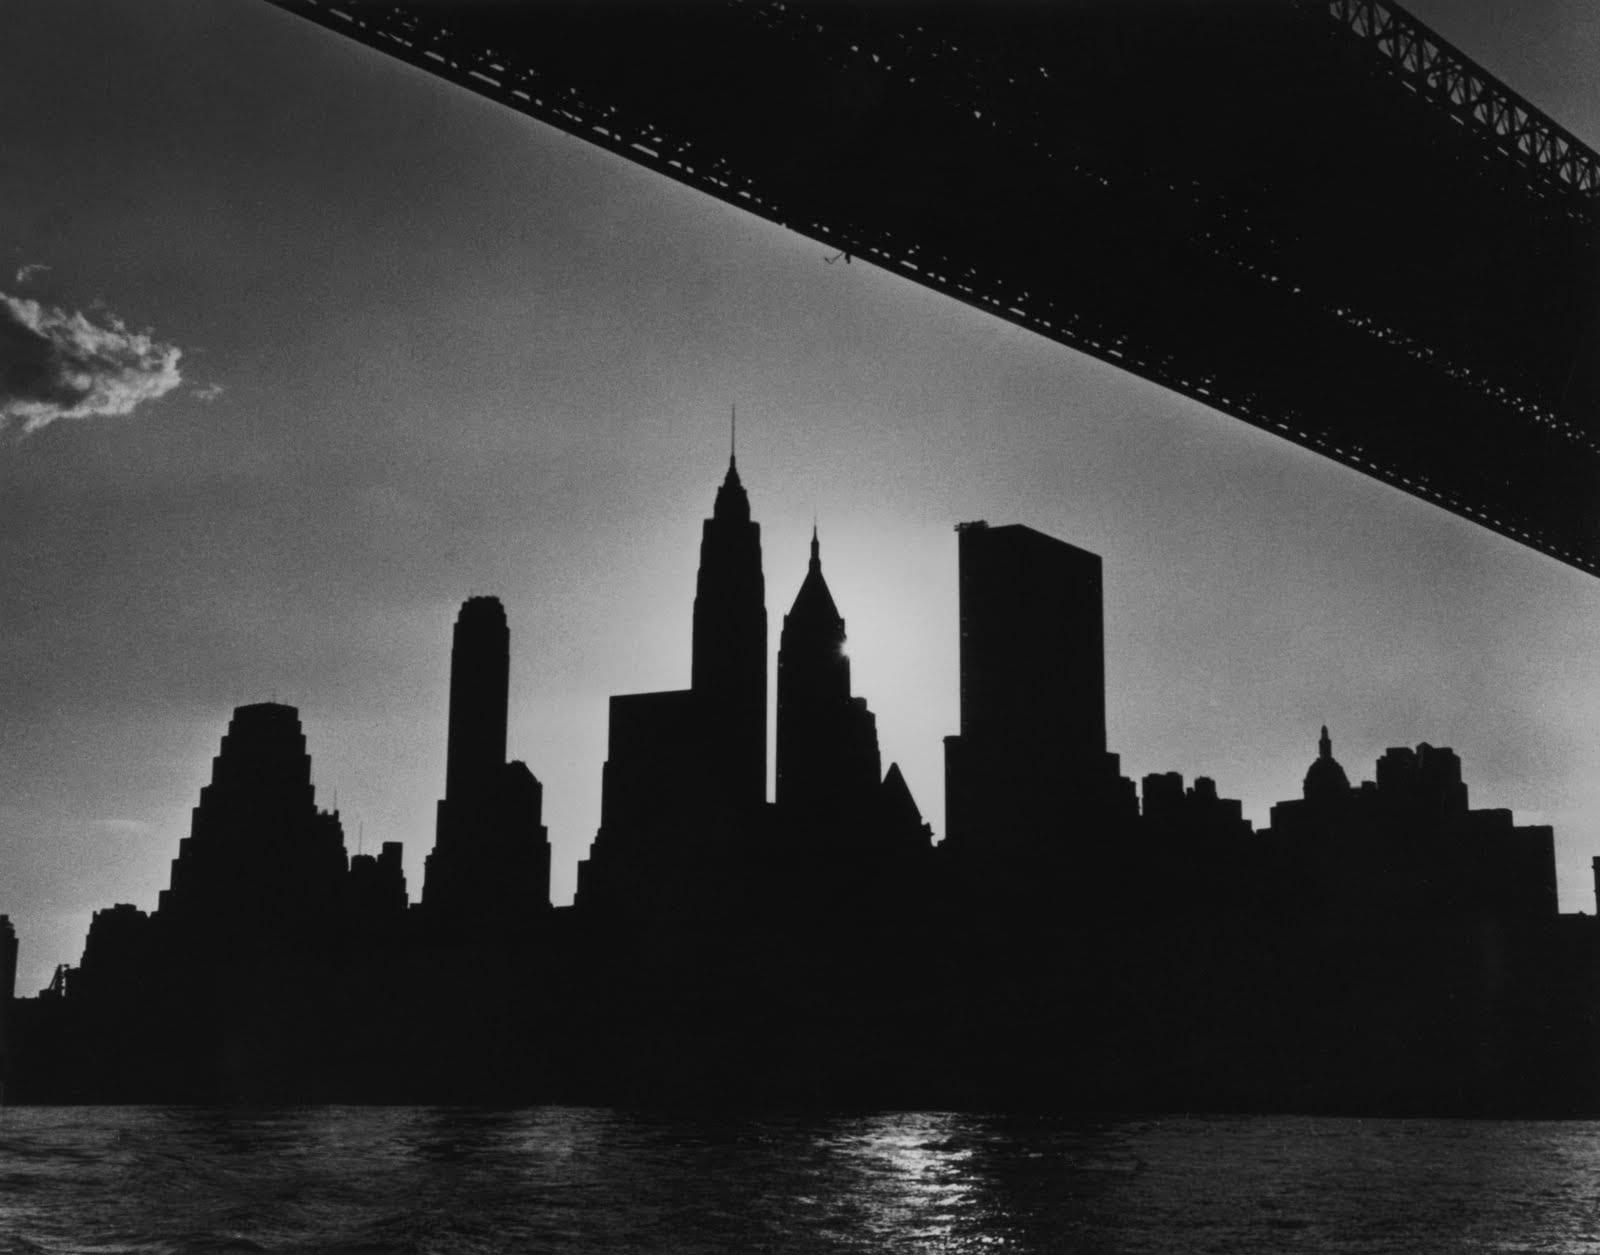 Kaip visam Niujorkui vienu metu dingo elektra